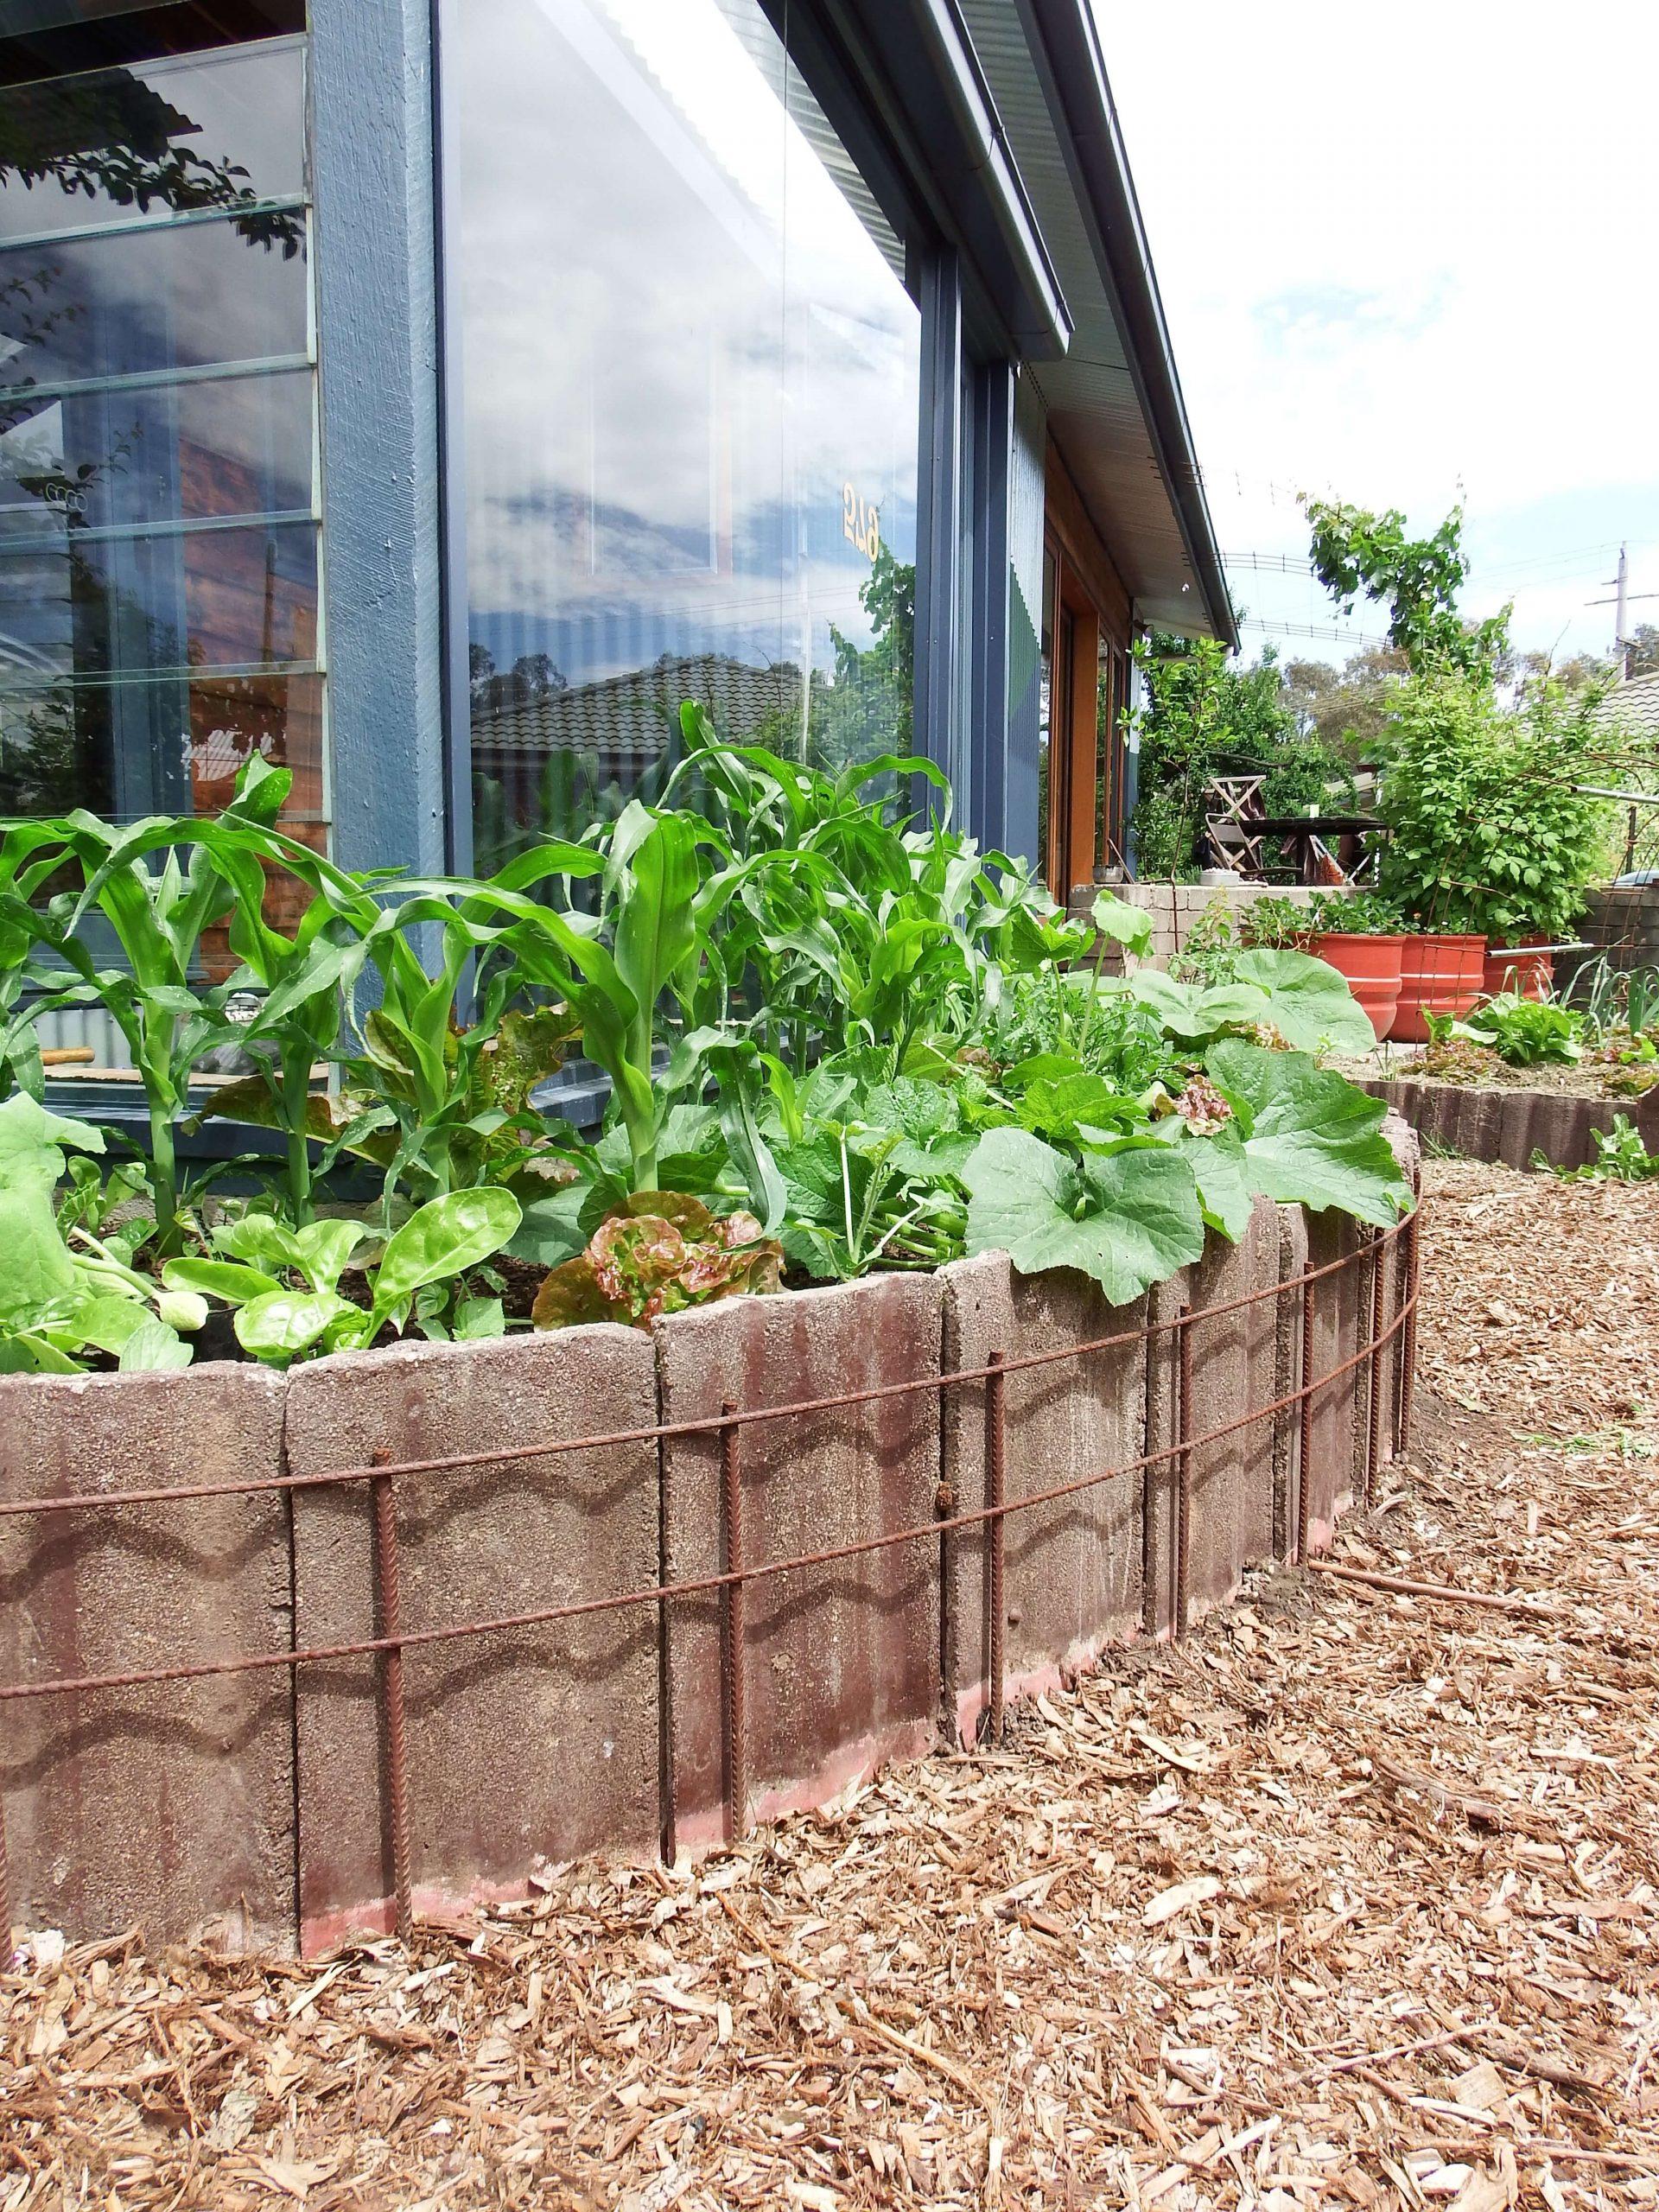 vyvyseny-zahon-zo-skridly-v-zahrade-stara-krytina-inspiracie